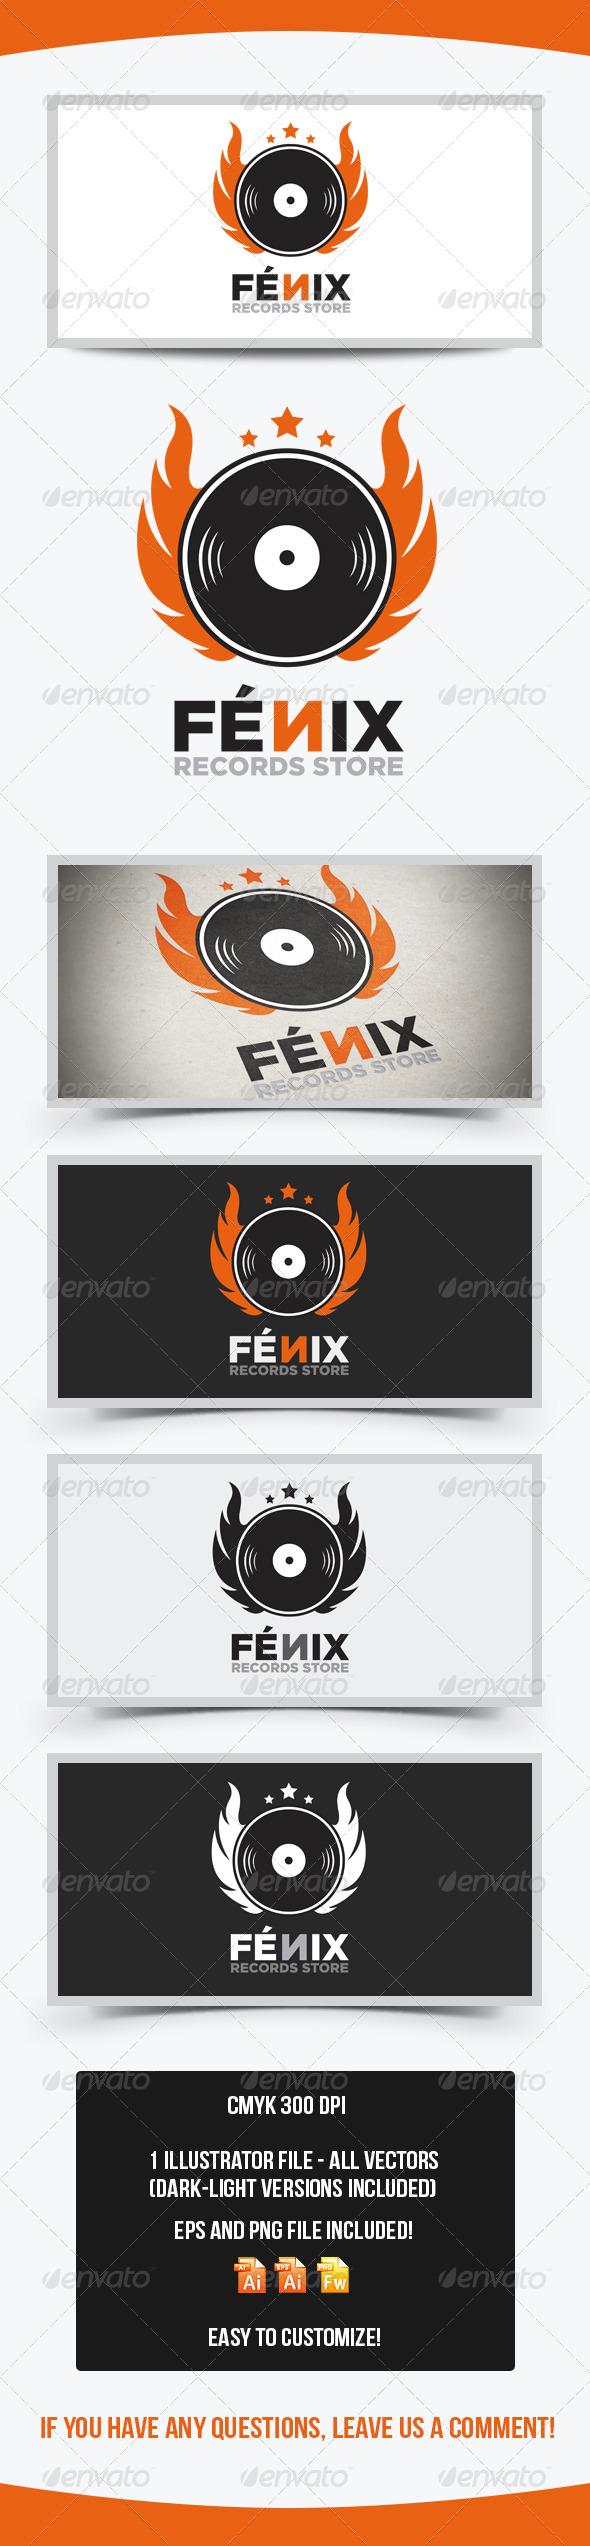 Fenix Records Store Logo Template